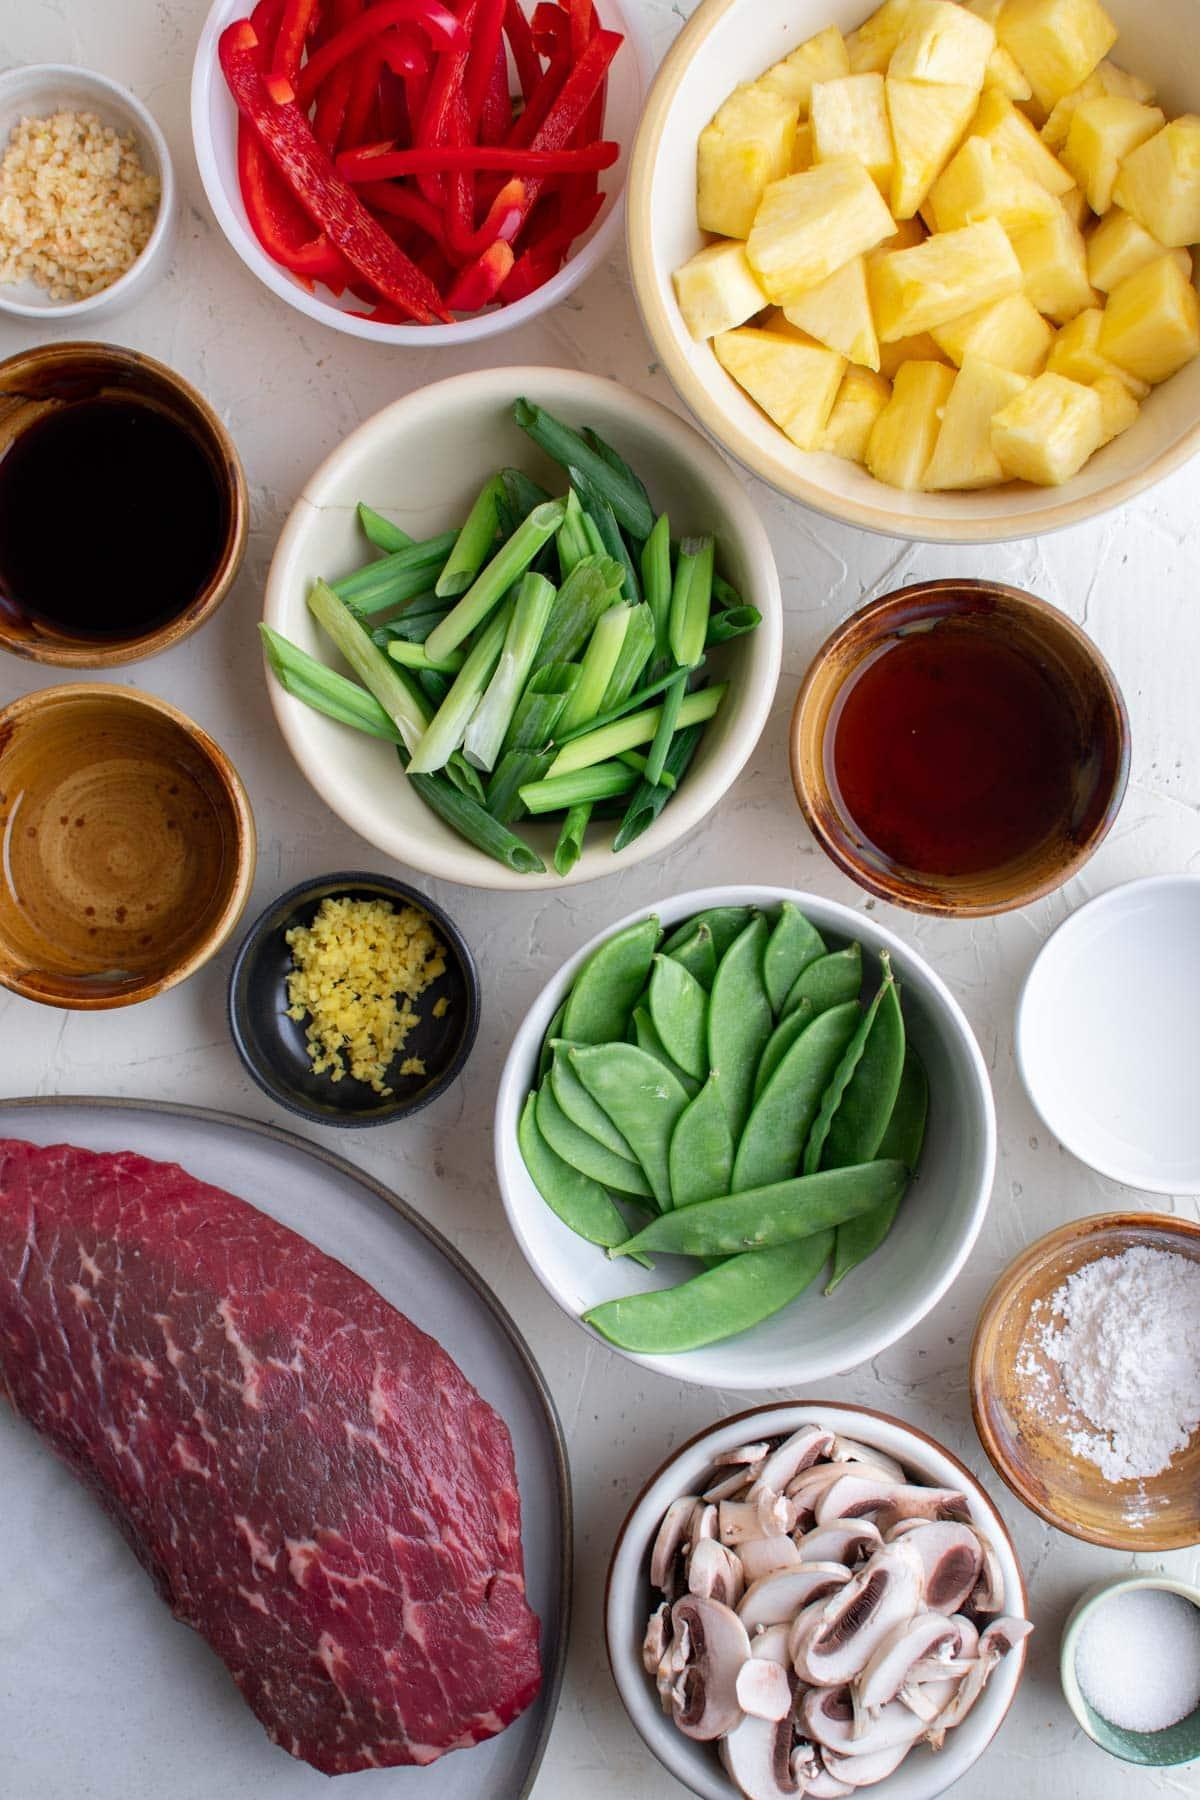 ingredients for making beef stir fry